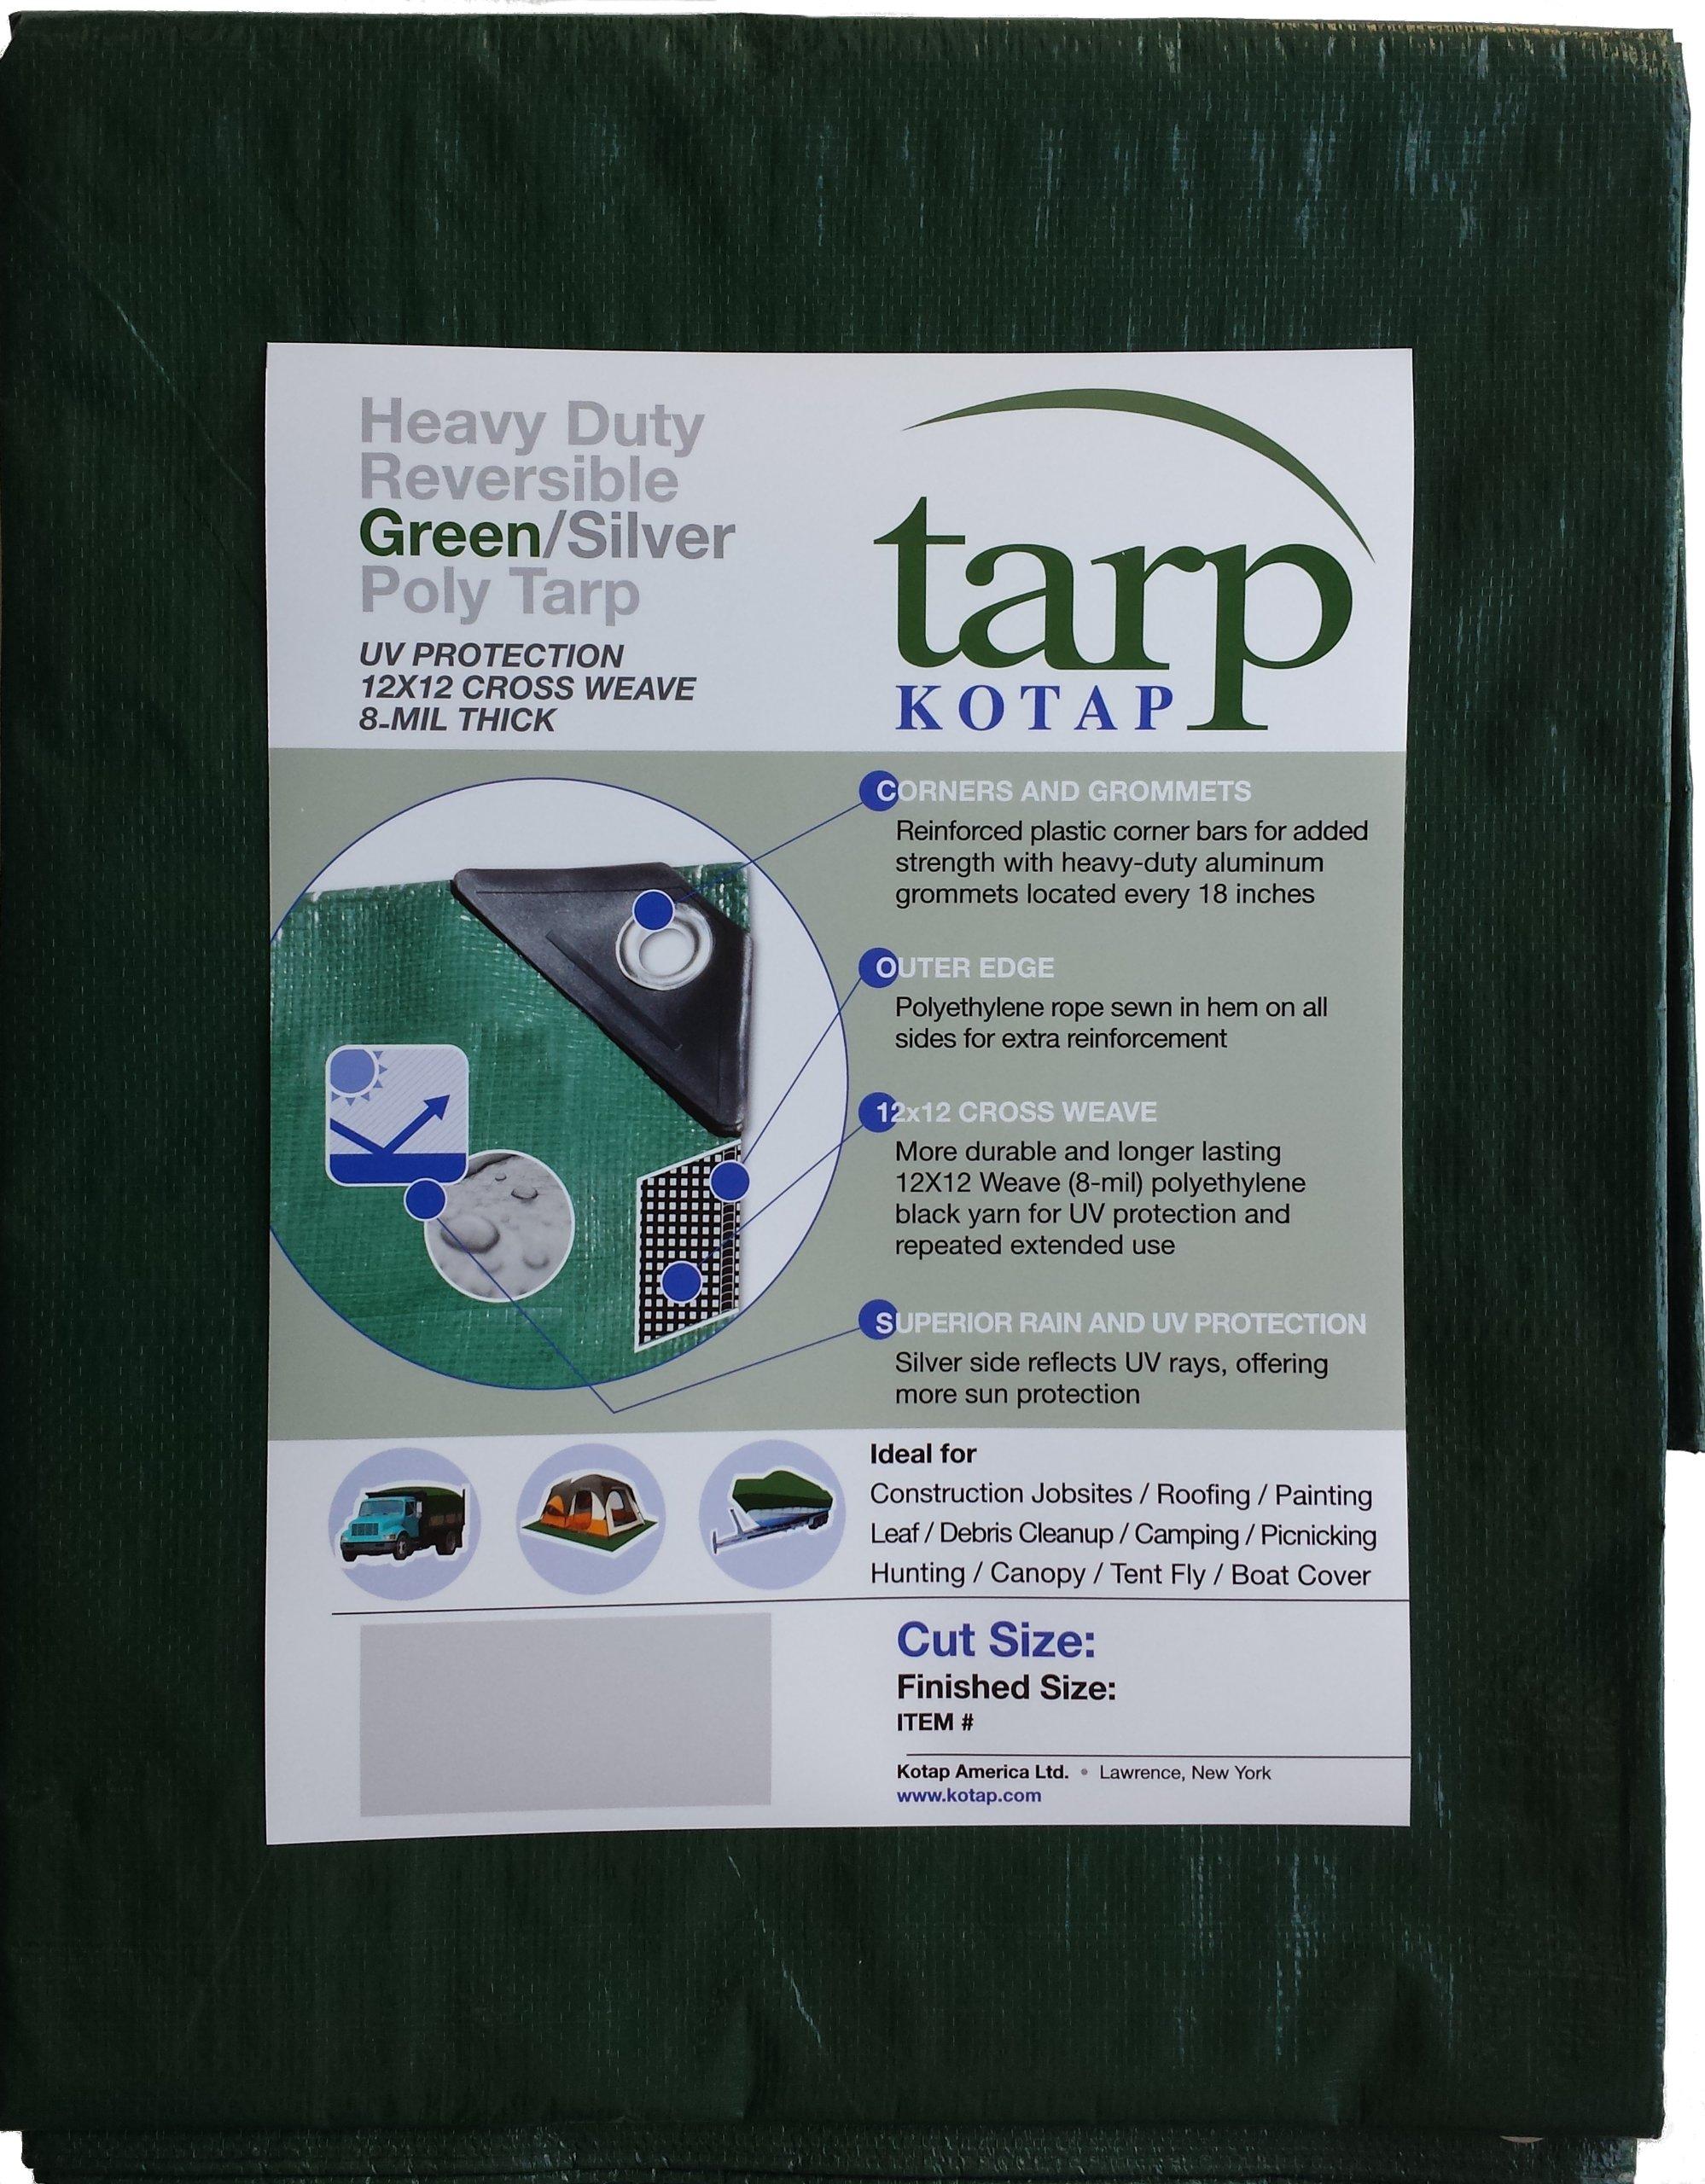 Kotap 12-ft x 14-ft Heavy-Duty 12 by 12 Cross Weave 8-mil Reversible Green/Silver Poly Tarp, Item: TGS-1214